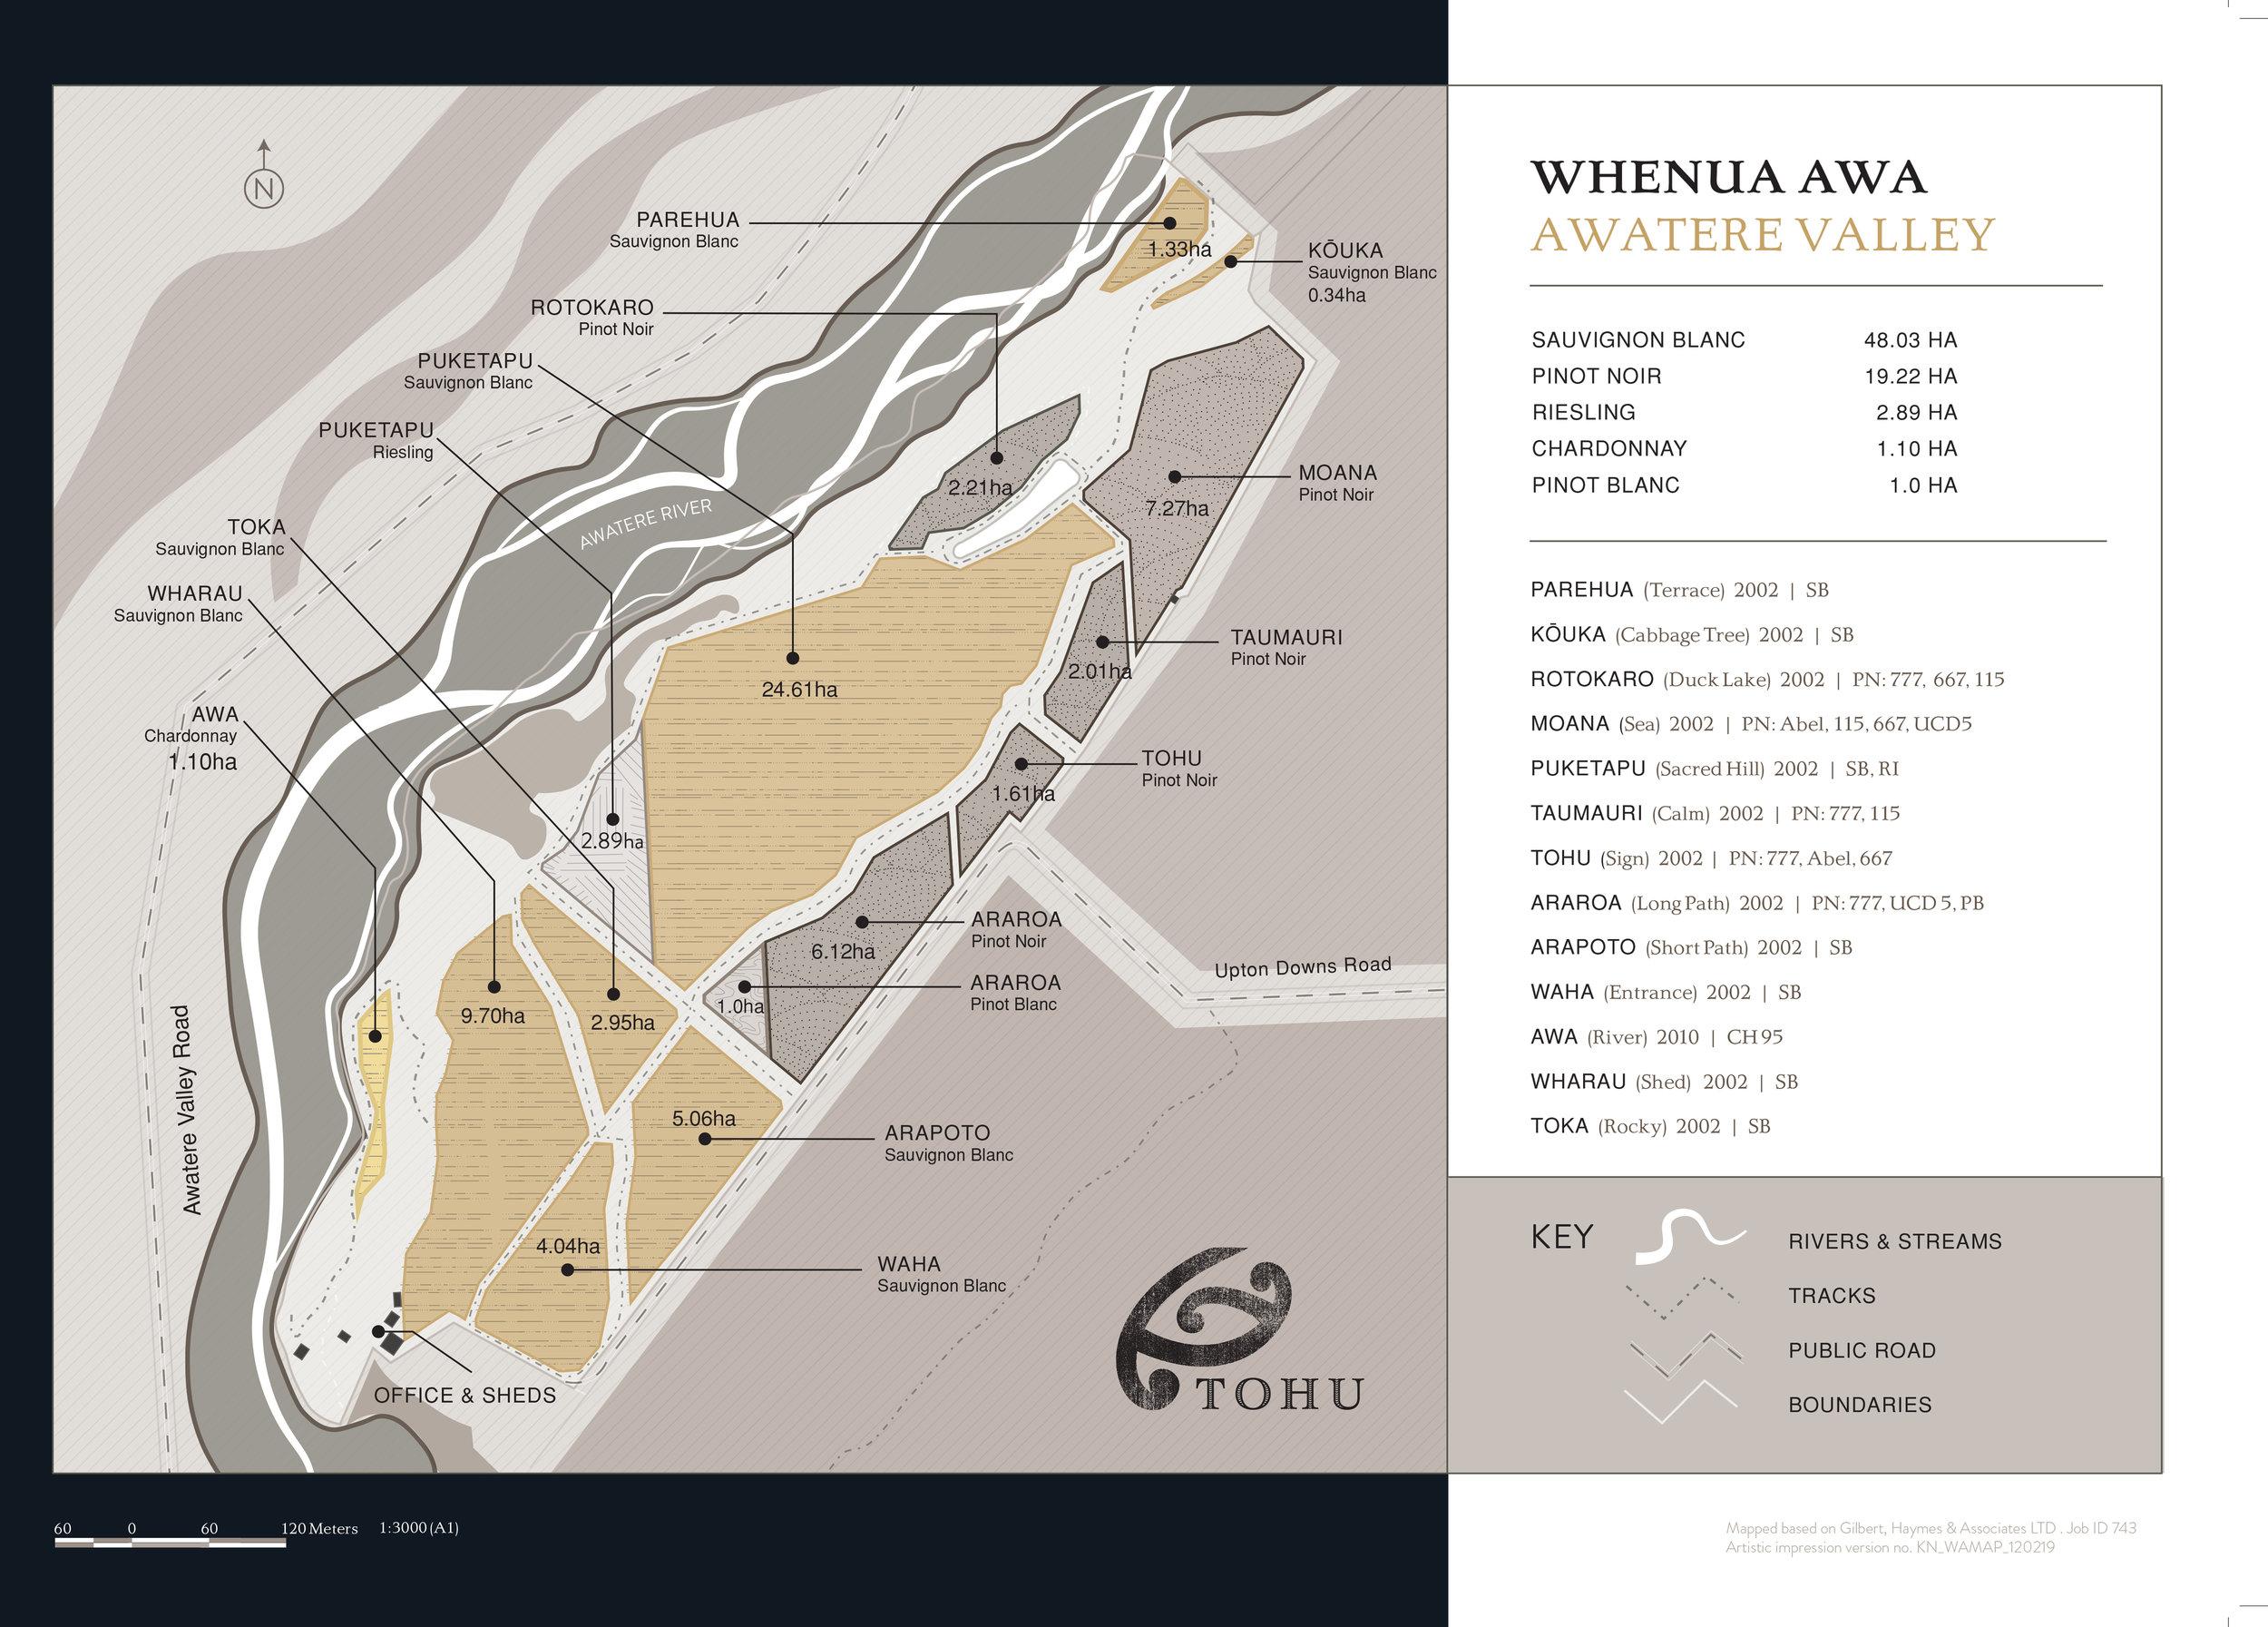 Whenua-Awa-Awatere-Valley.jpg